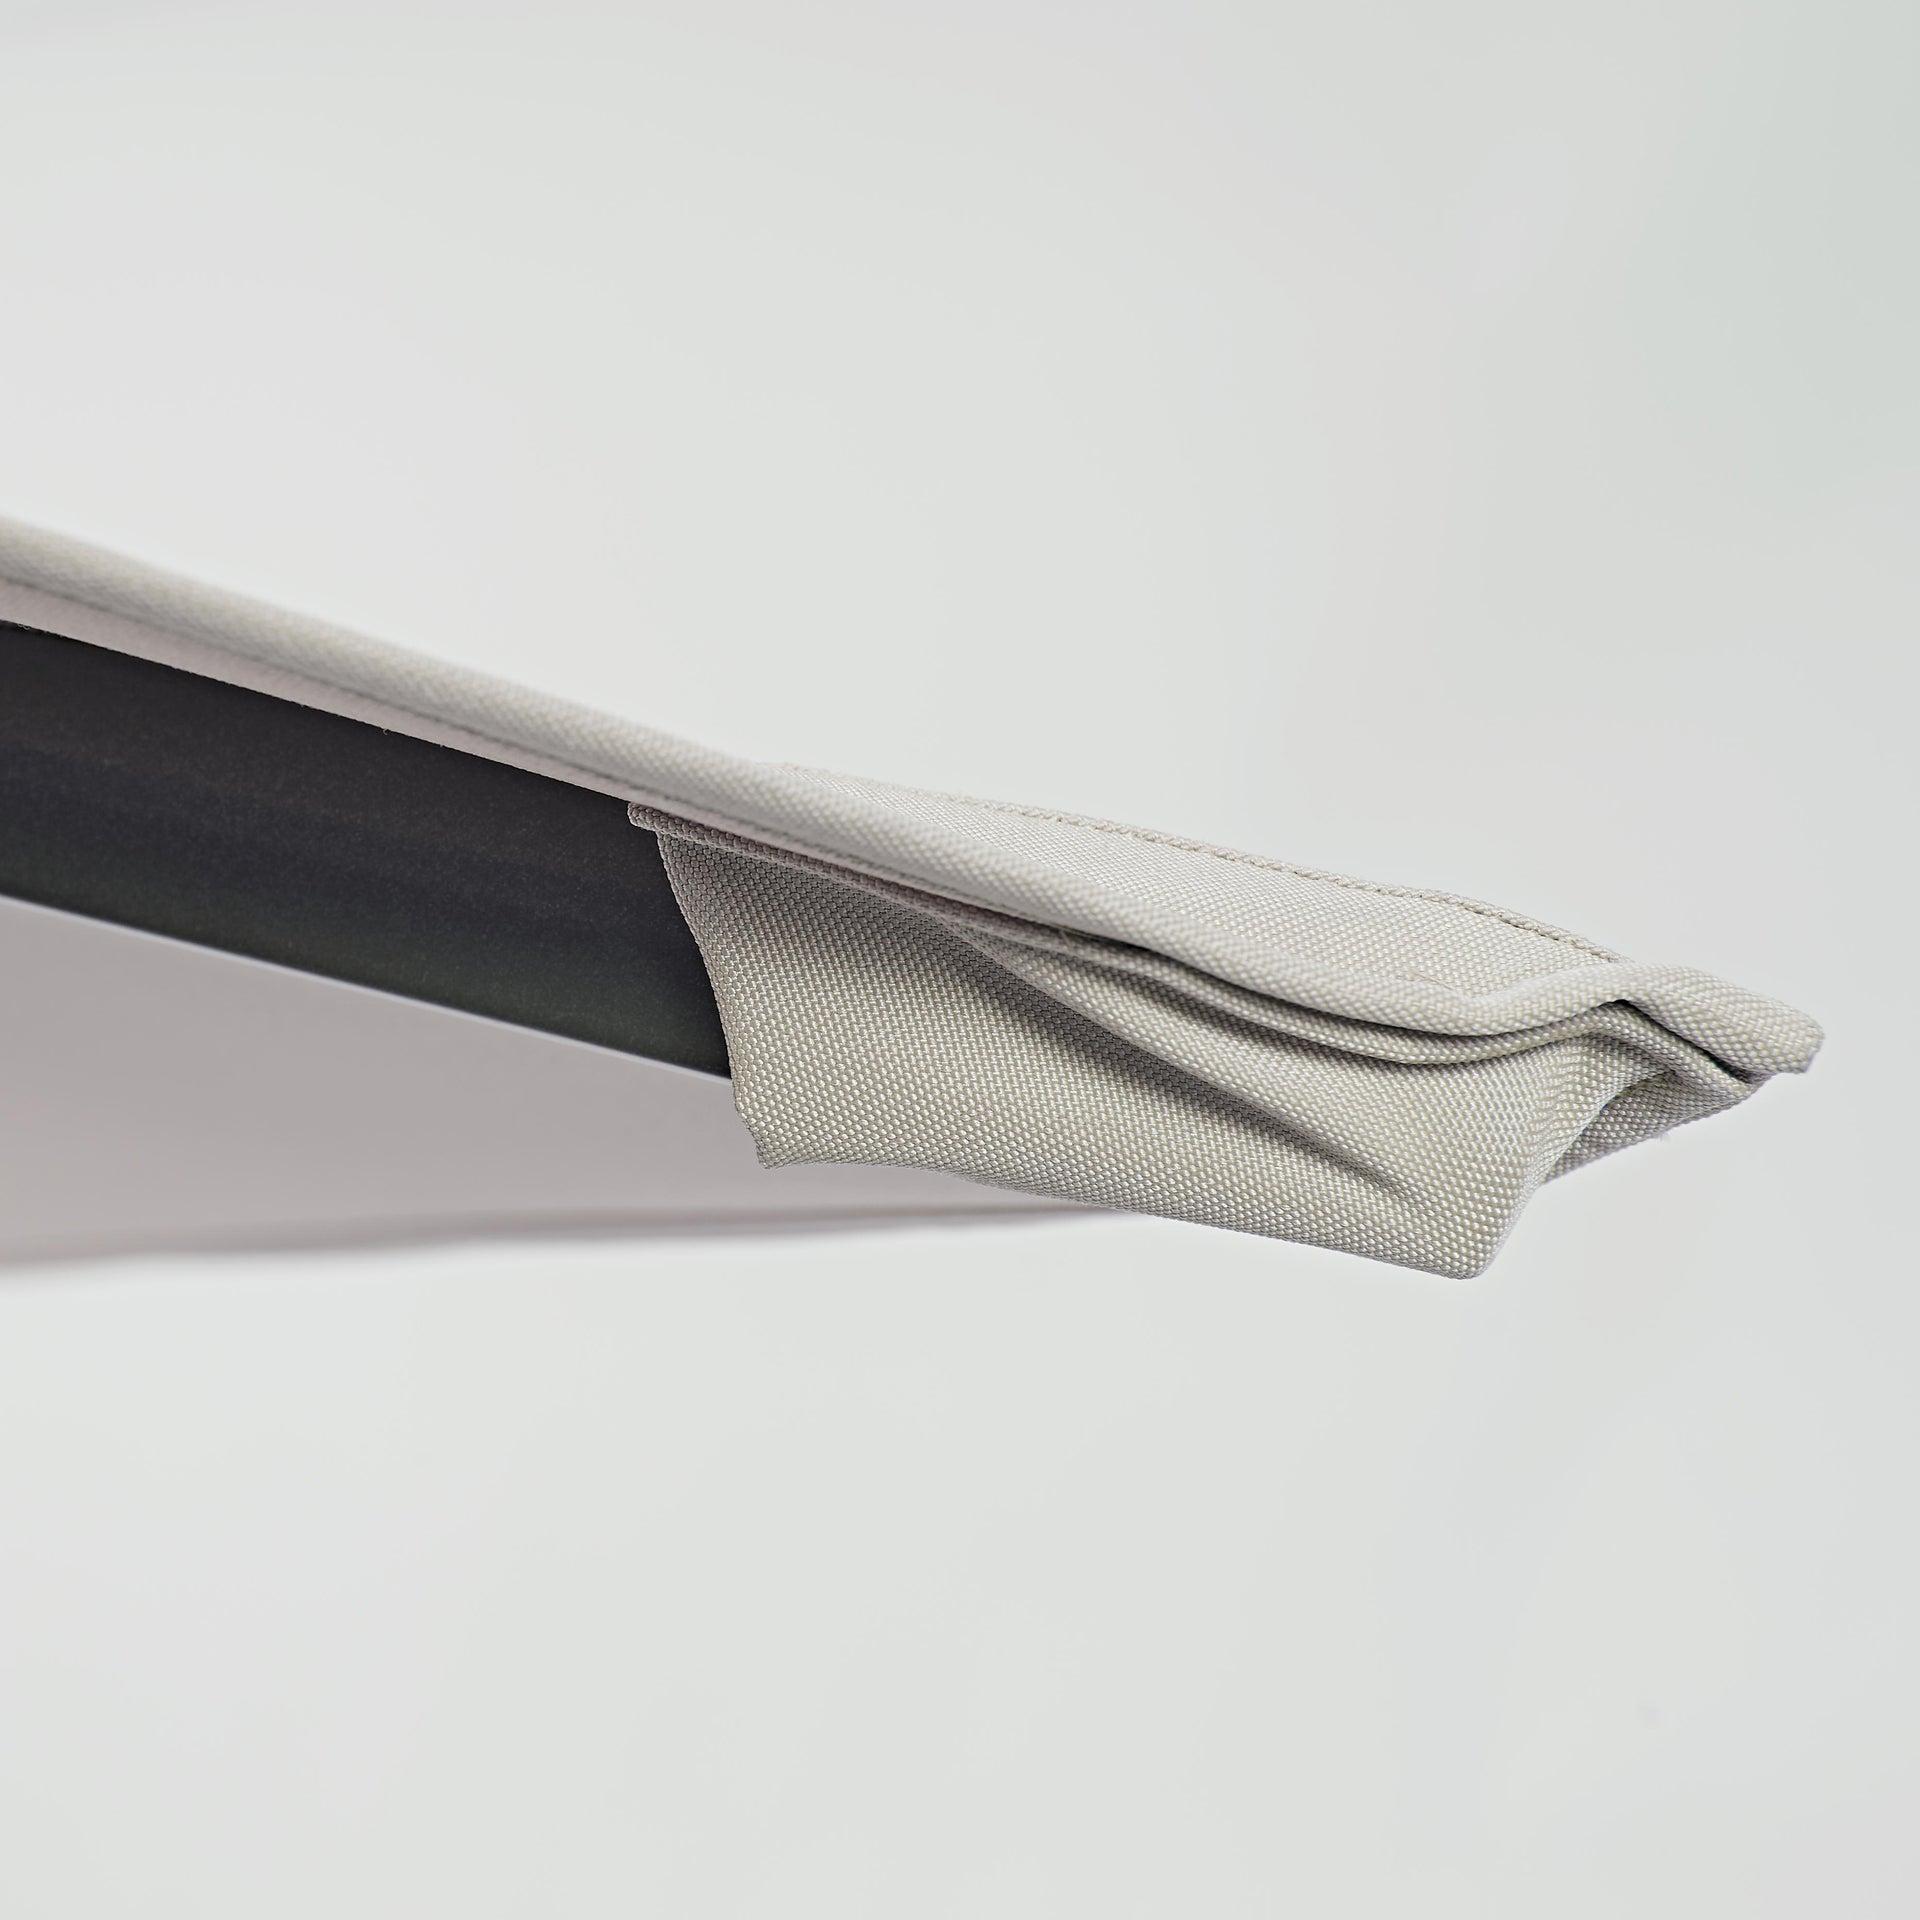 Ombrellone NATERIAL Aura L 2.81 x P 3.86 m color tortora - 11